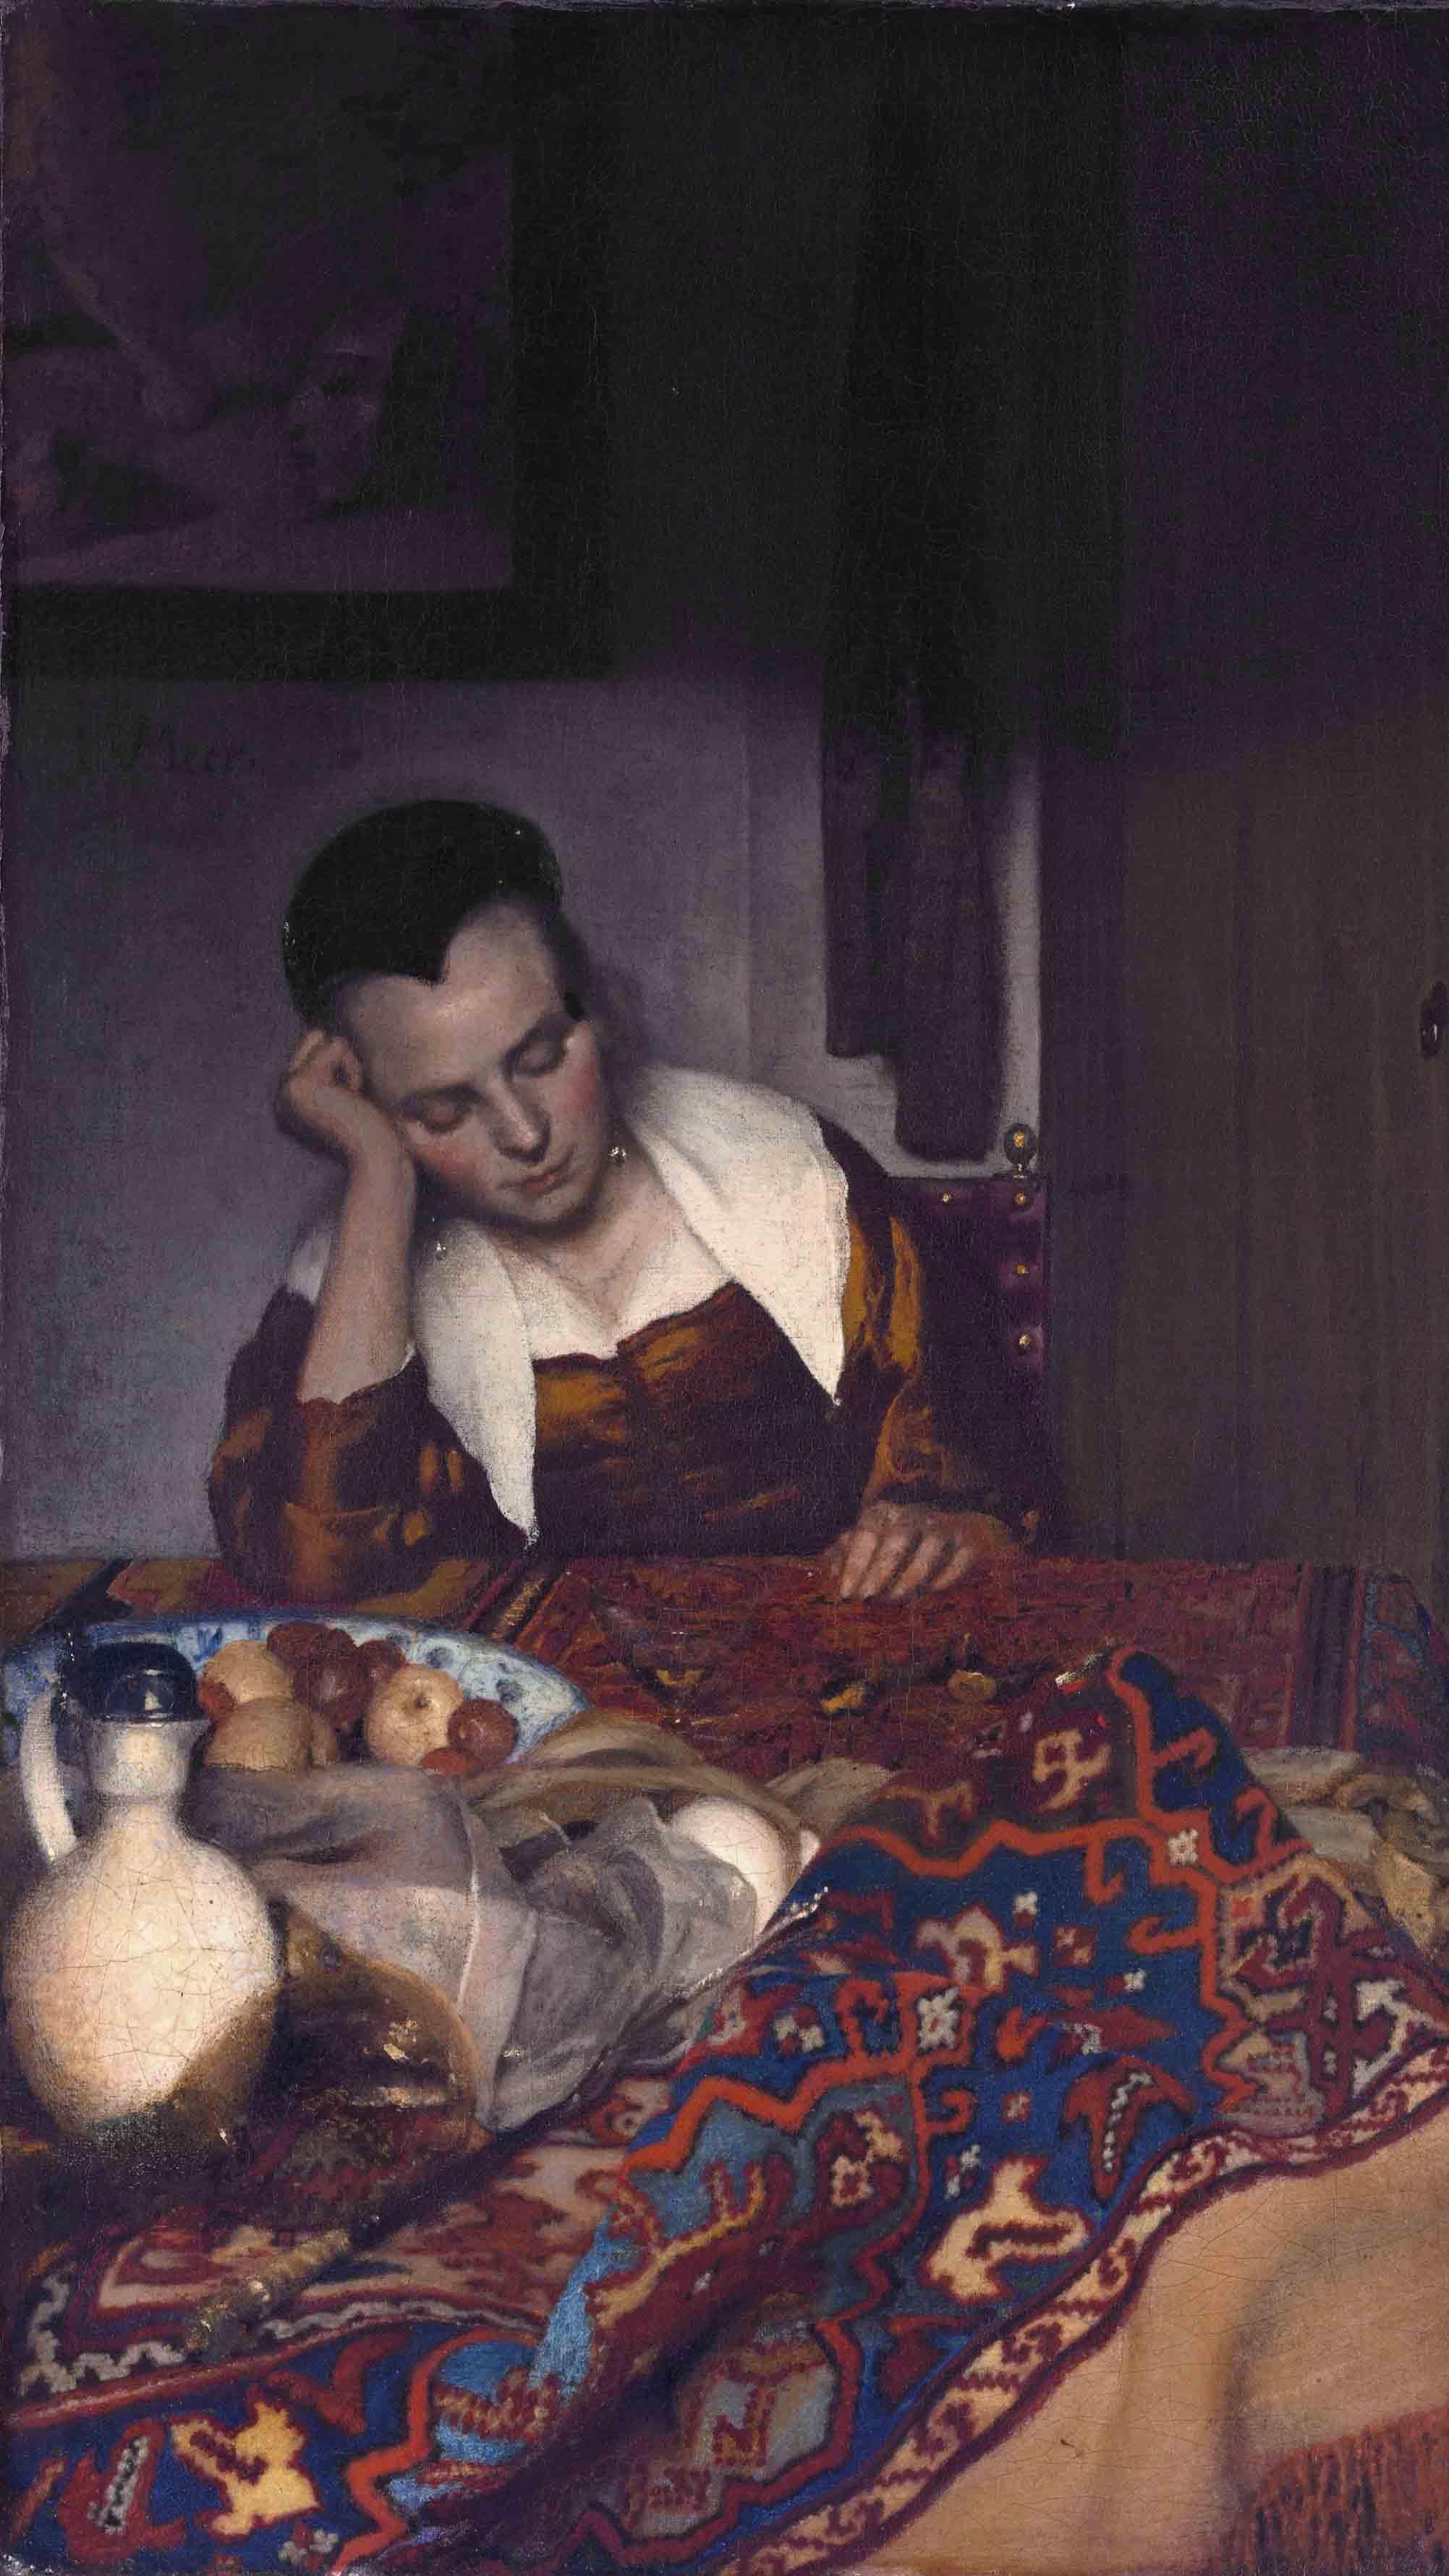 http://cinegrafix.eu/wp-content/uploads/2017/02/20121117-Vermeer_young_women_sleeping-21.jpg